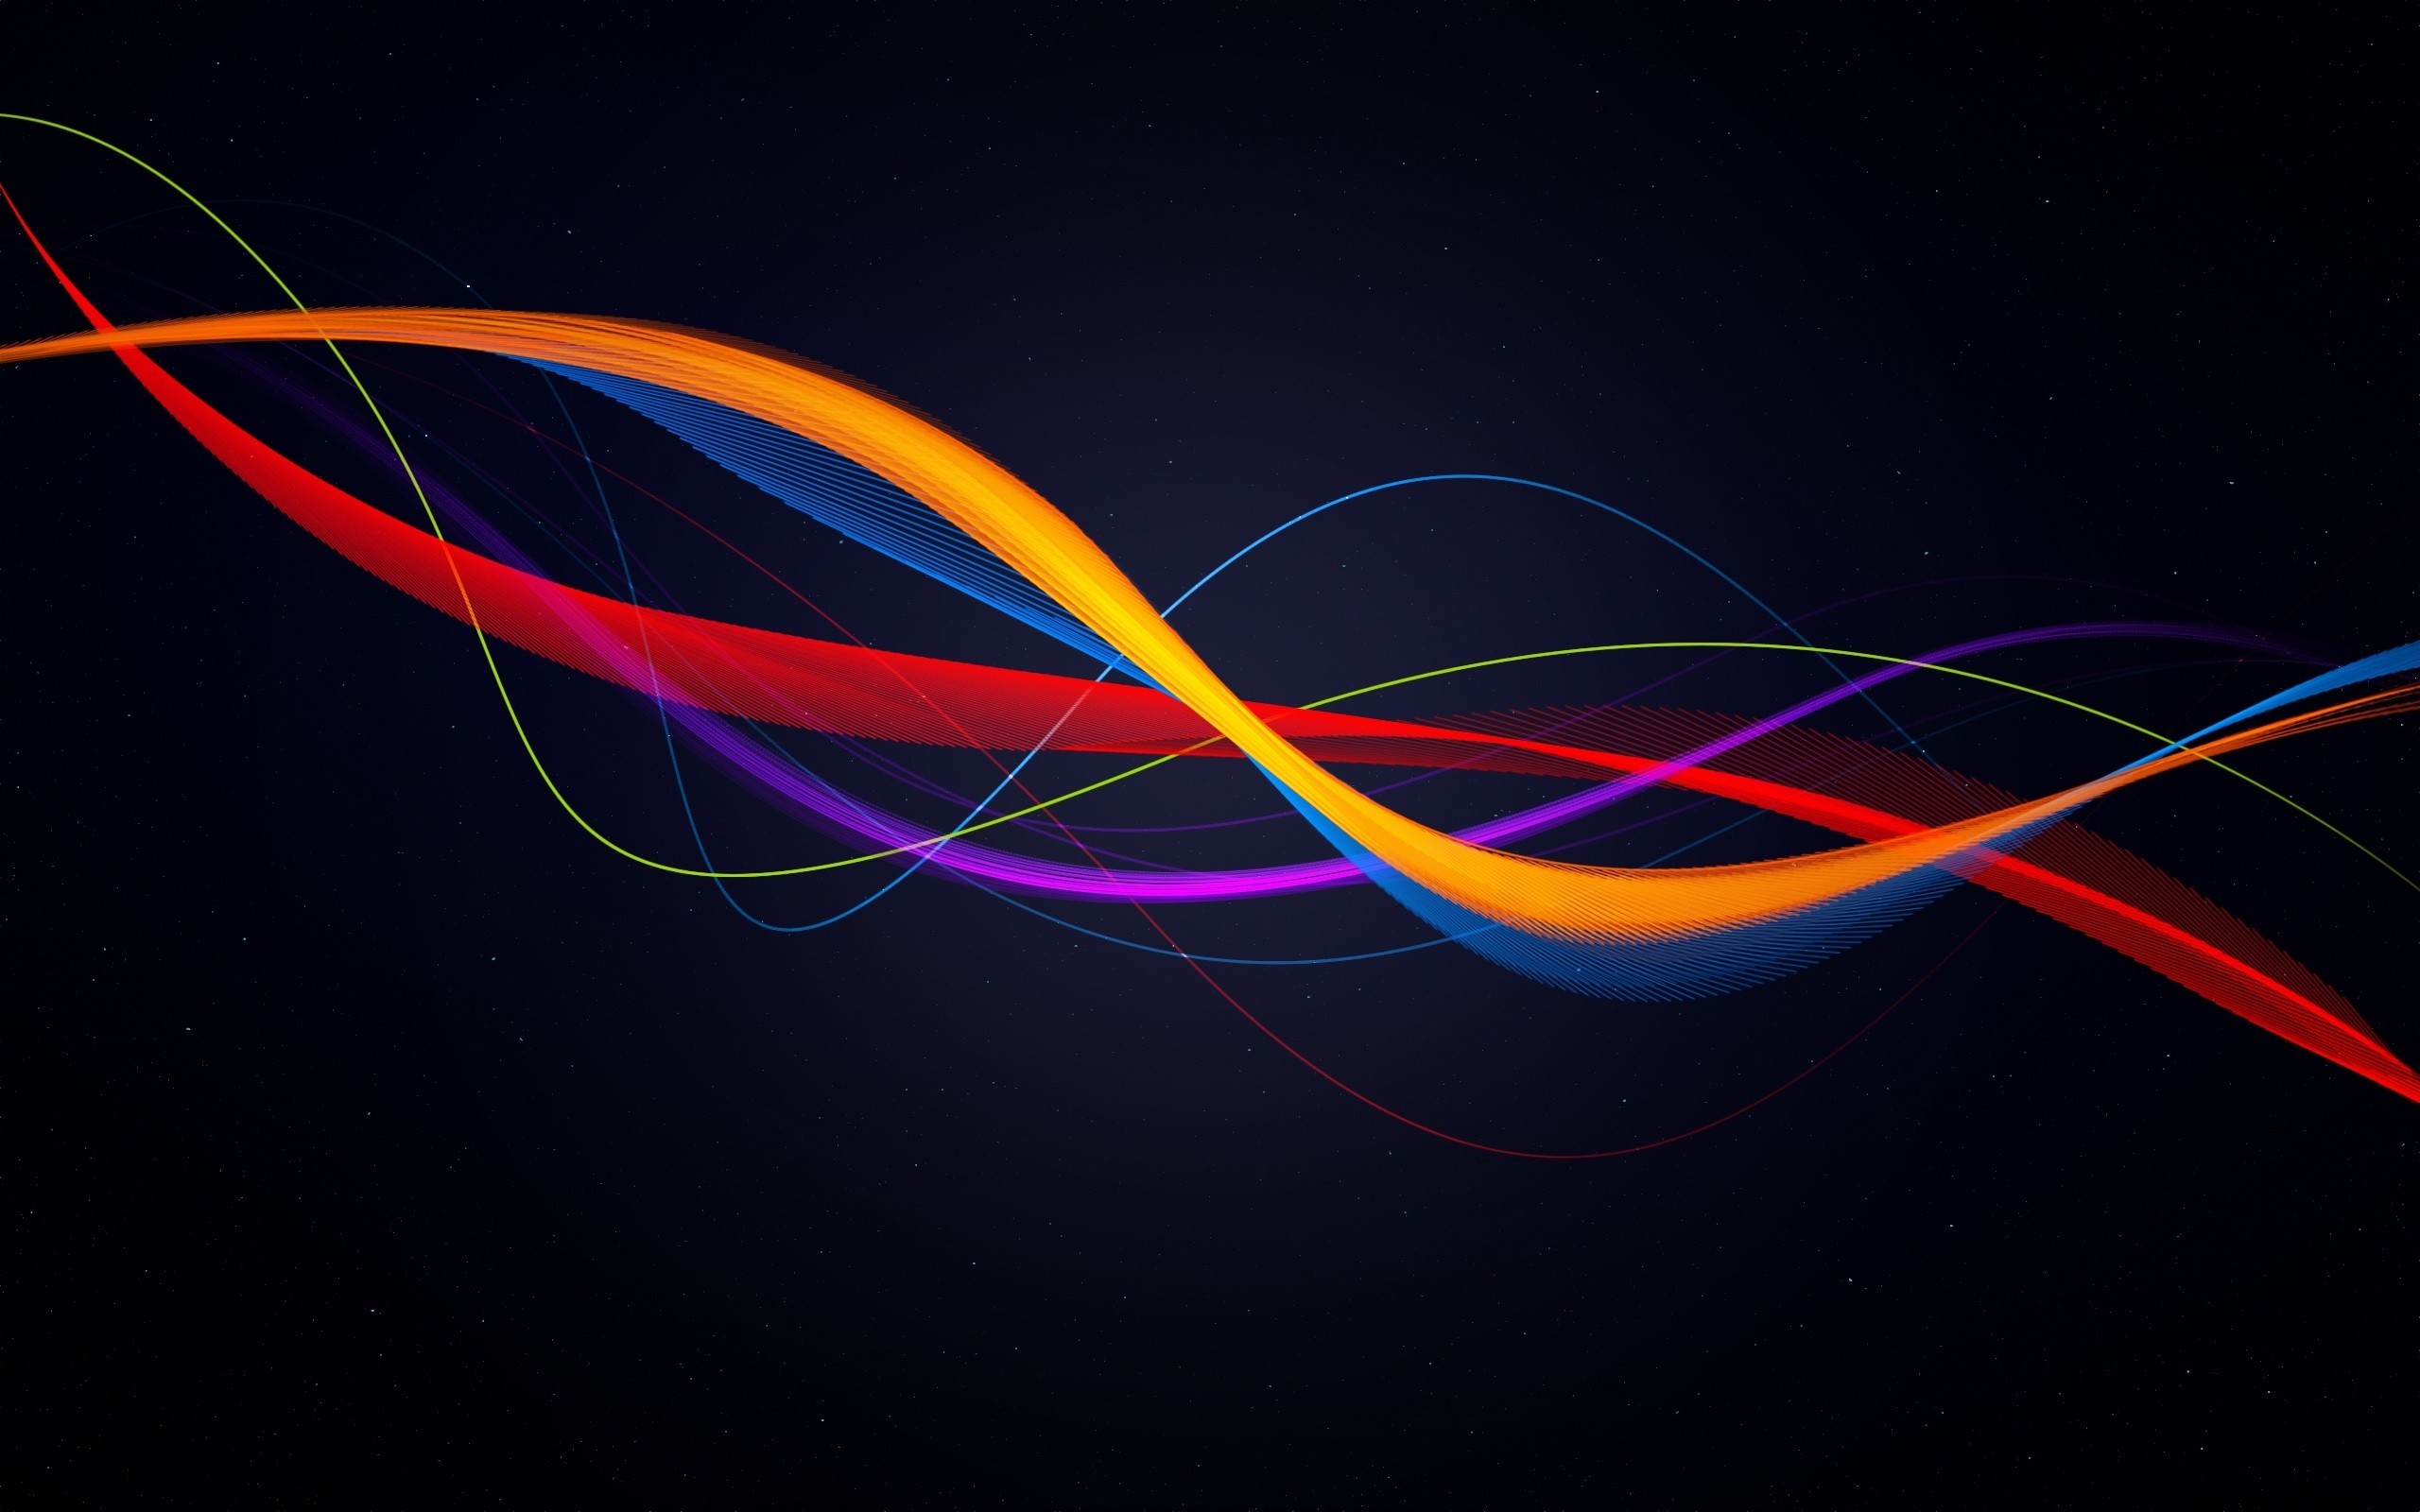 Colourful space swirl wallpaper